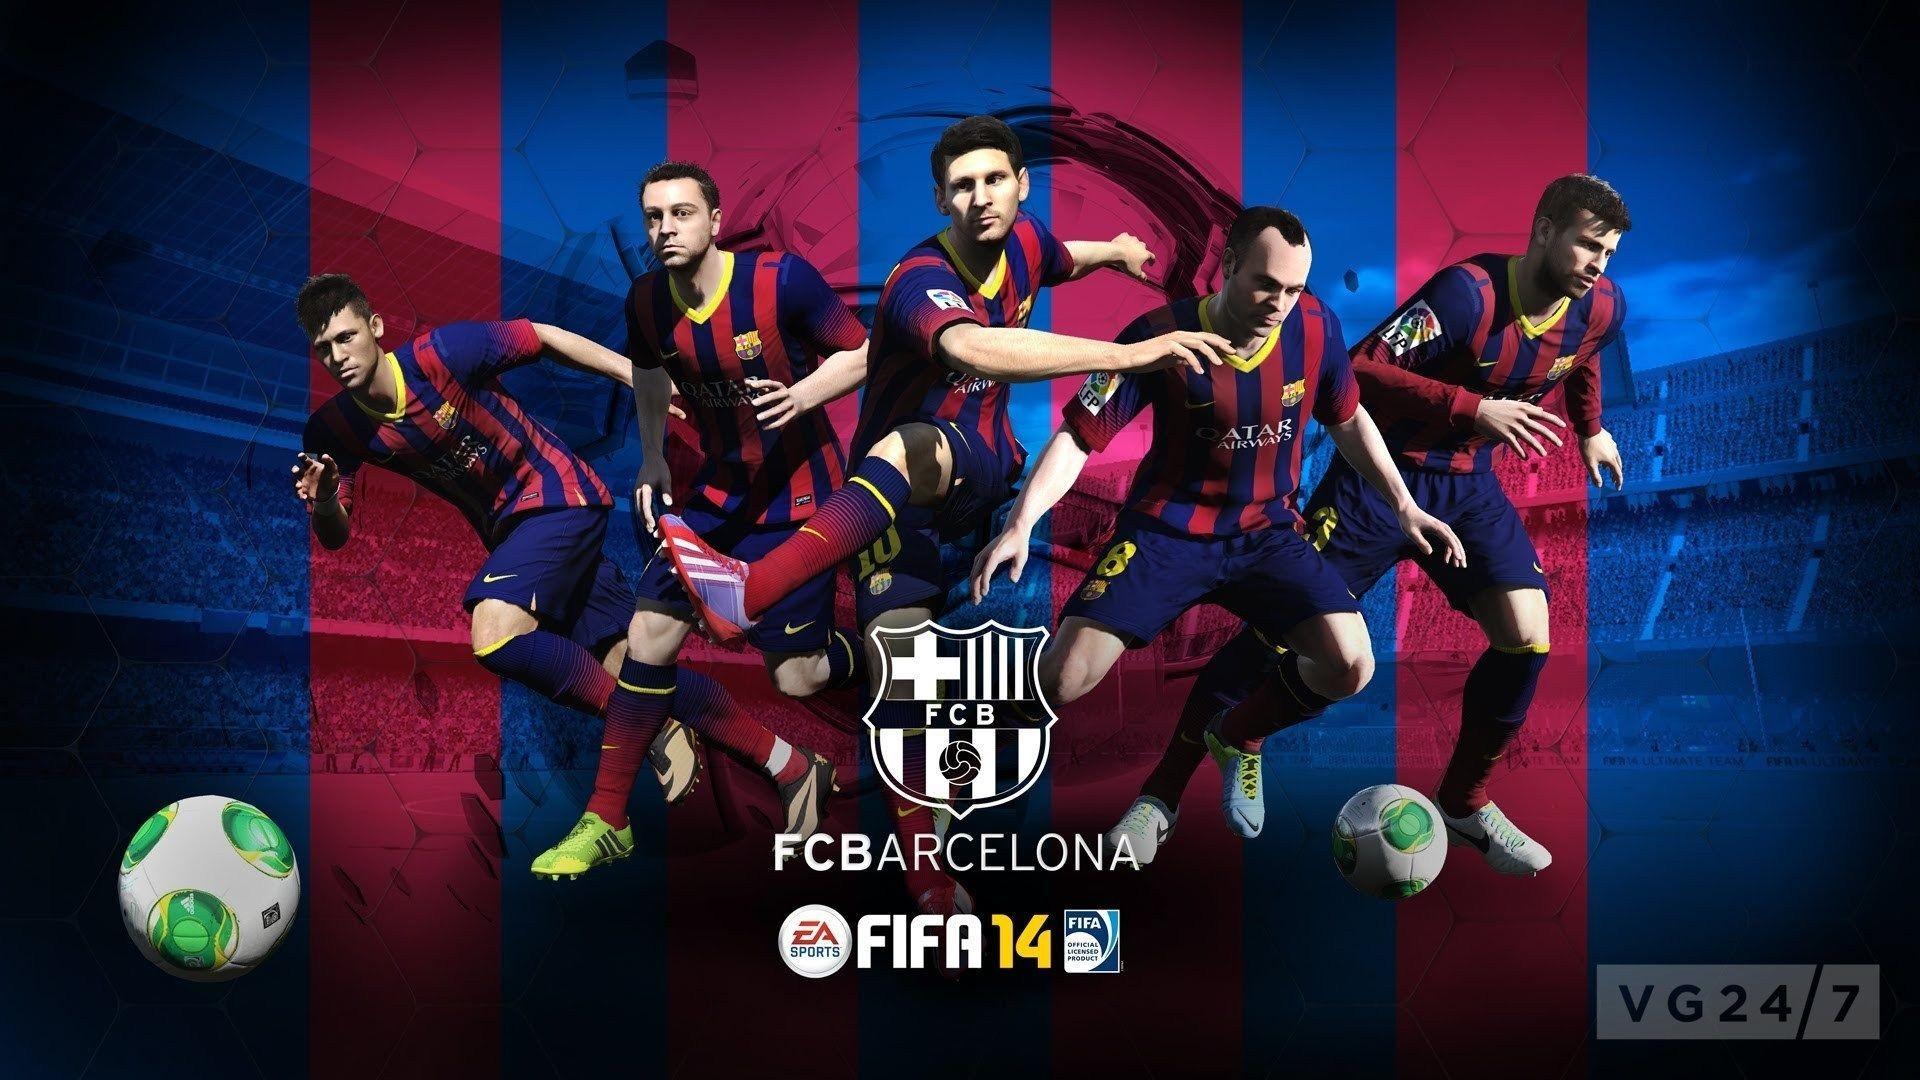 FCB Wallpapers FC Barcelona 1920×1080 Fcb Wallpaper (45 Wallpapers)    Adorable Wallpapers